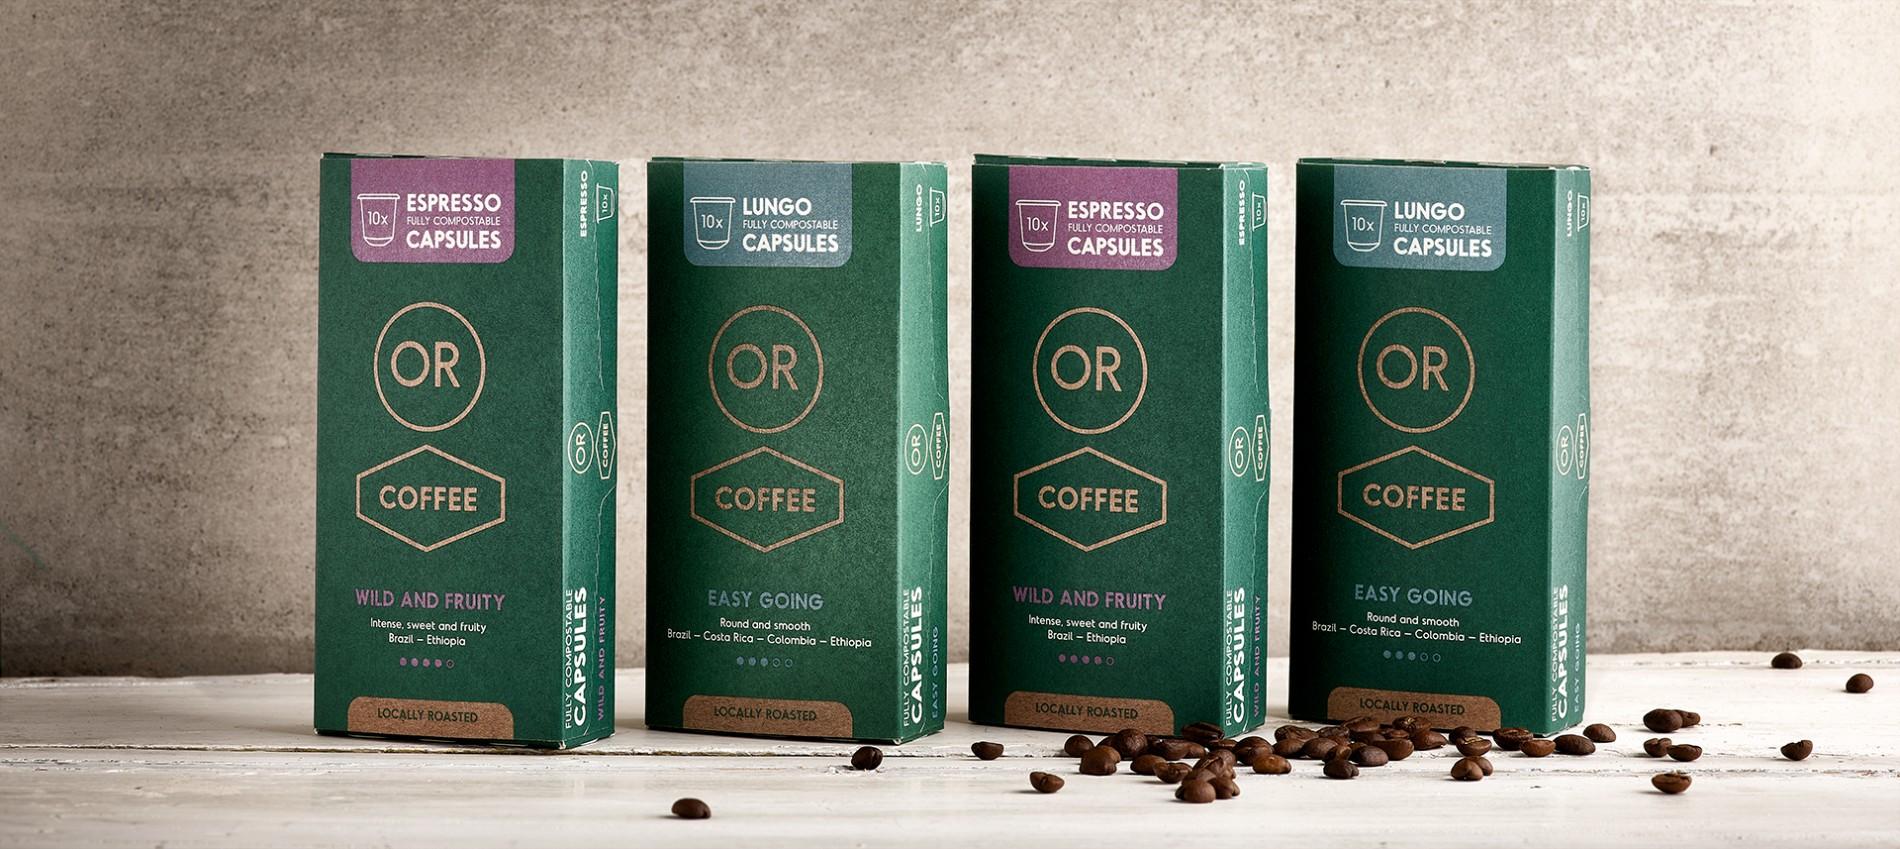 Quatre Mains package design - Package design coffee, or, quatre mains